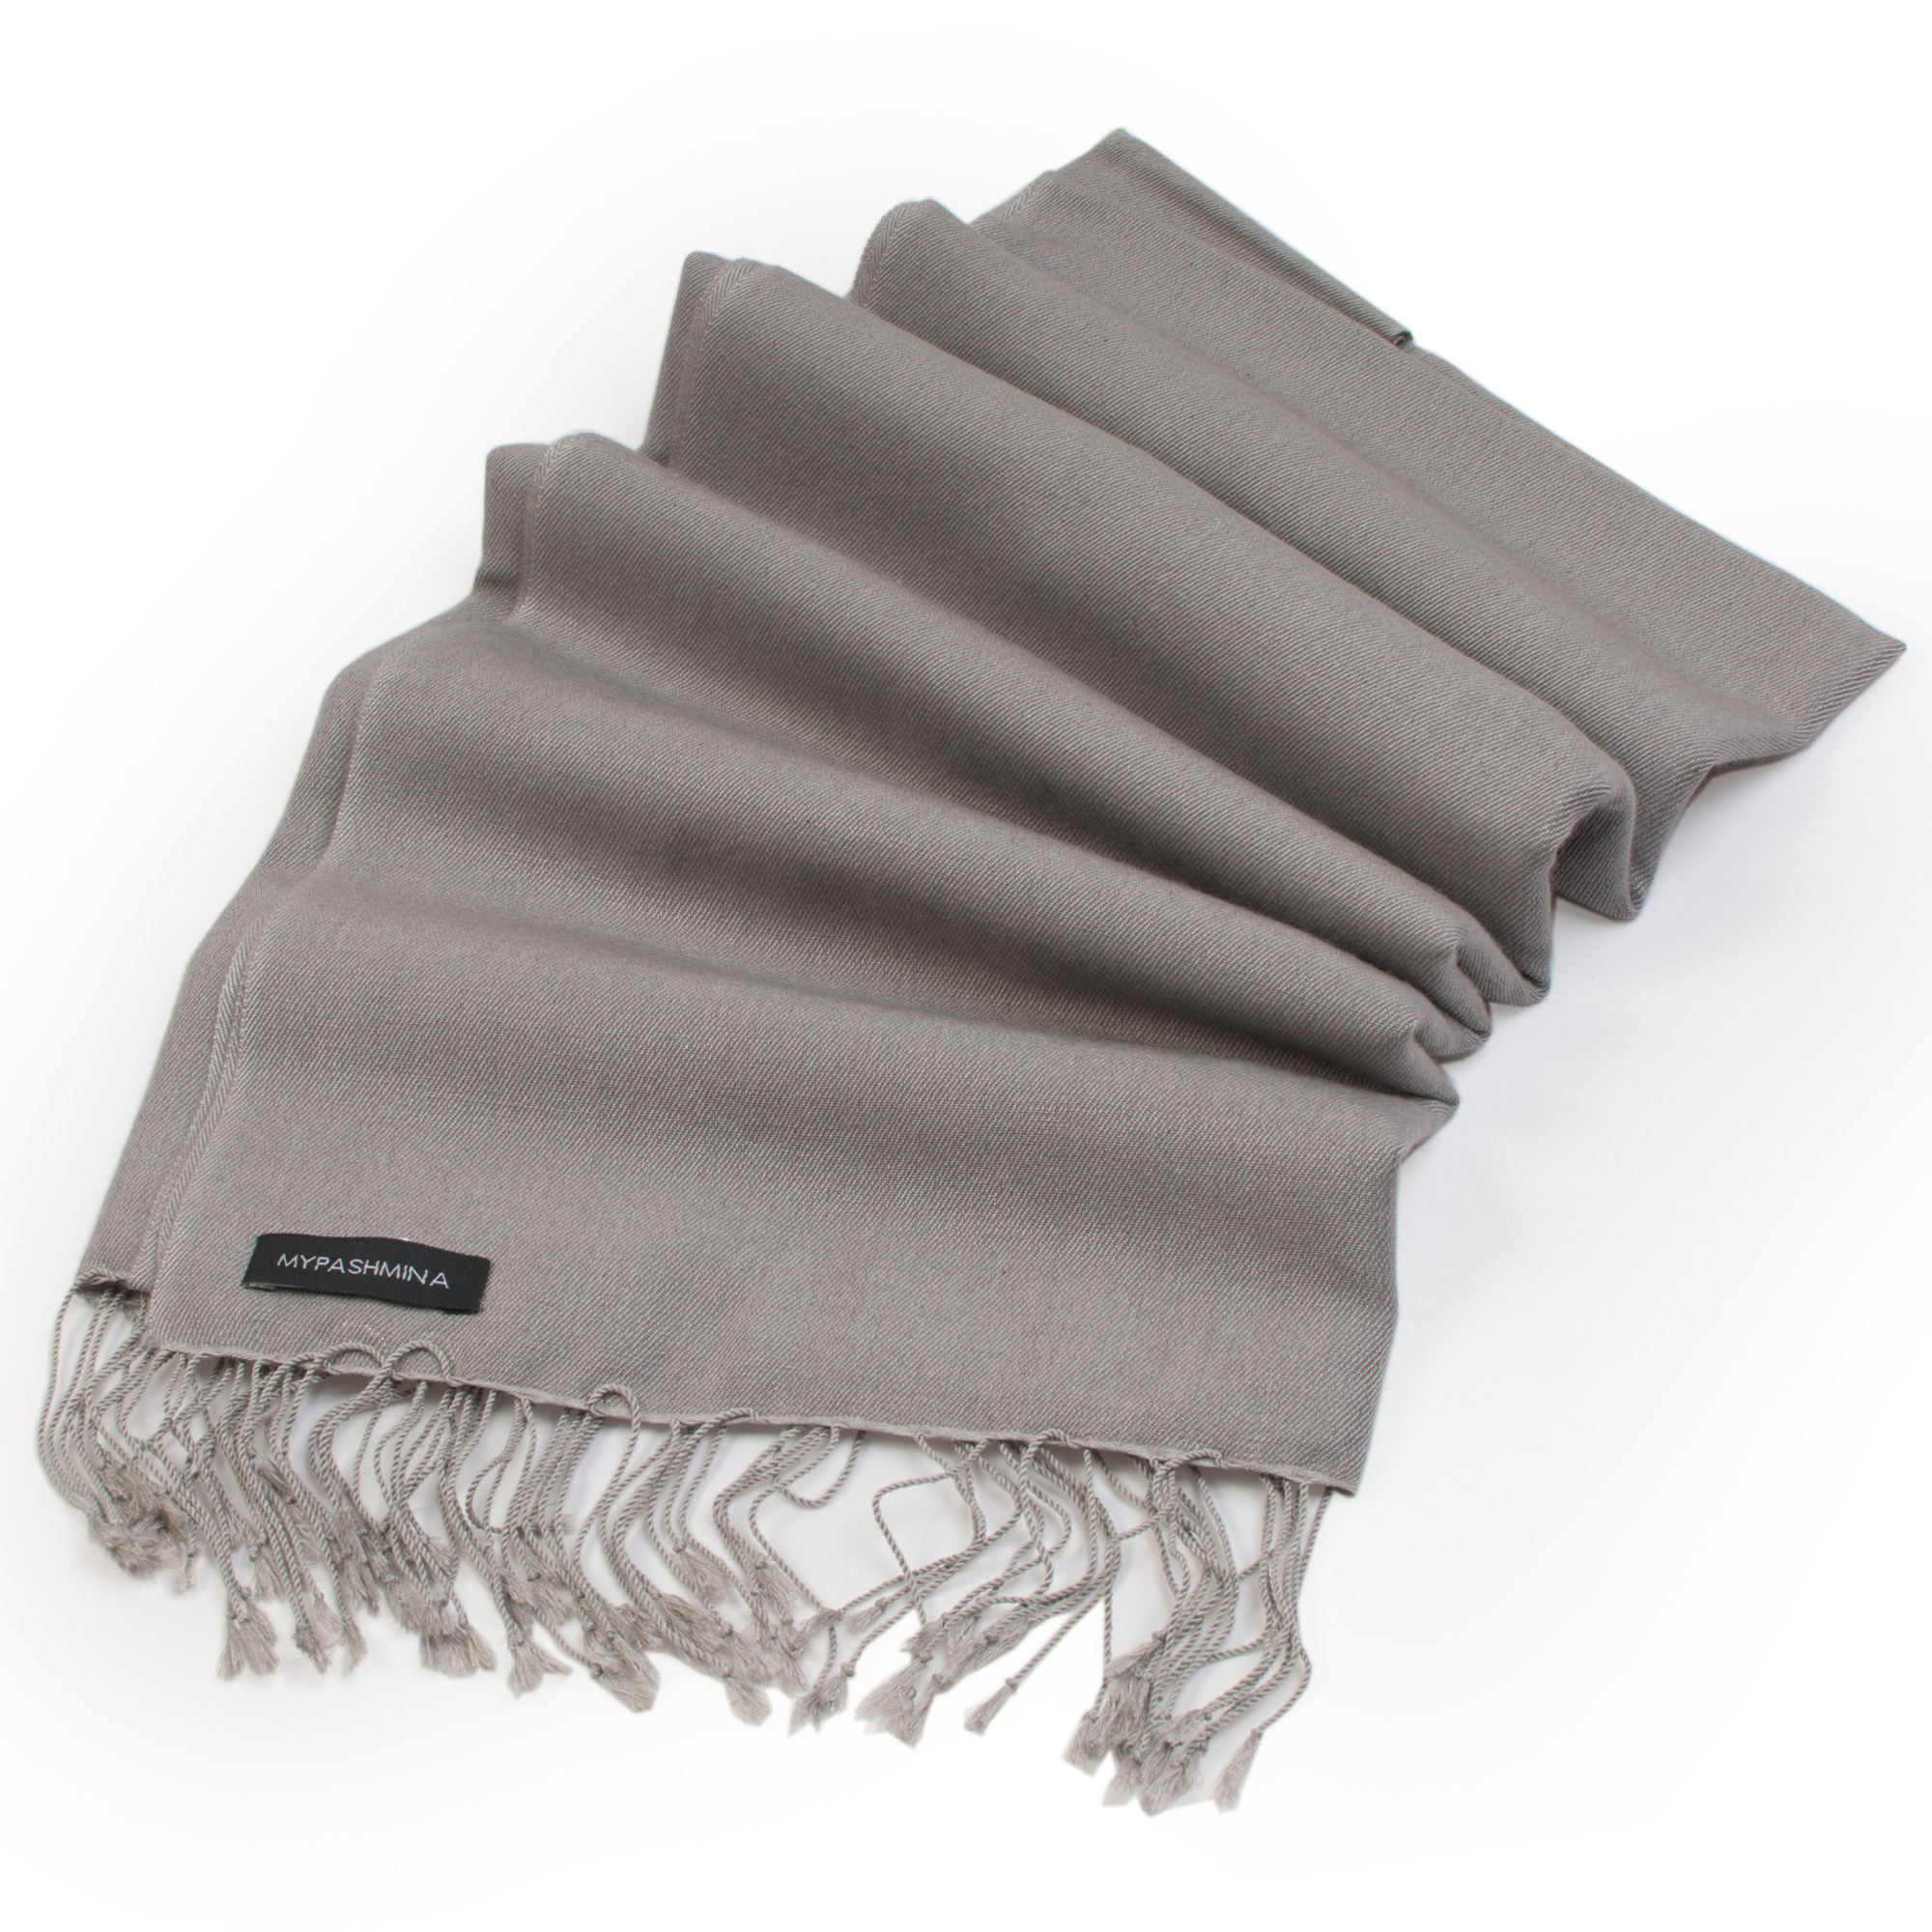 Pashmina Medium Stole - 55x200cm - 70% Cashmere/30% Silk - Steeple Grey